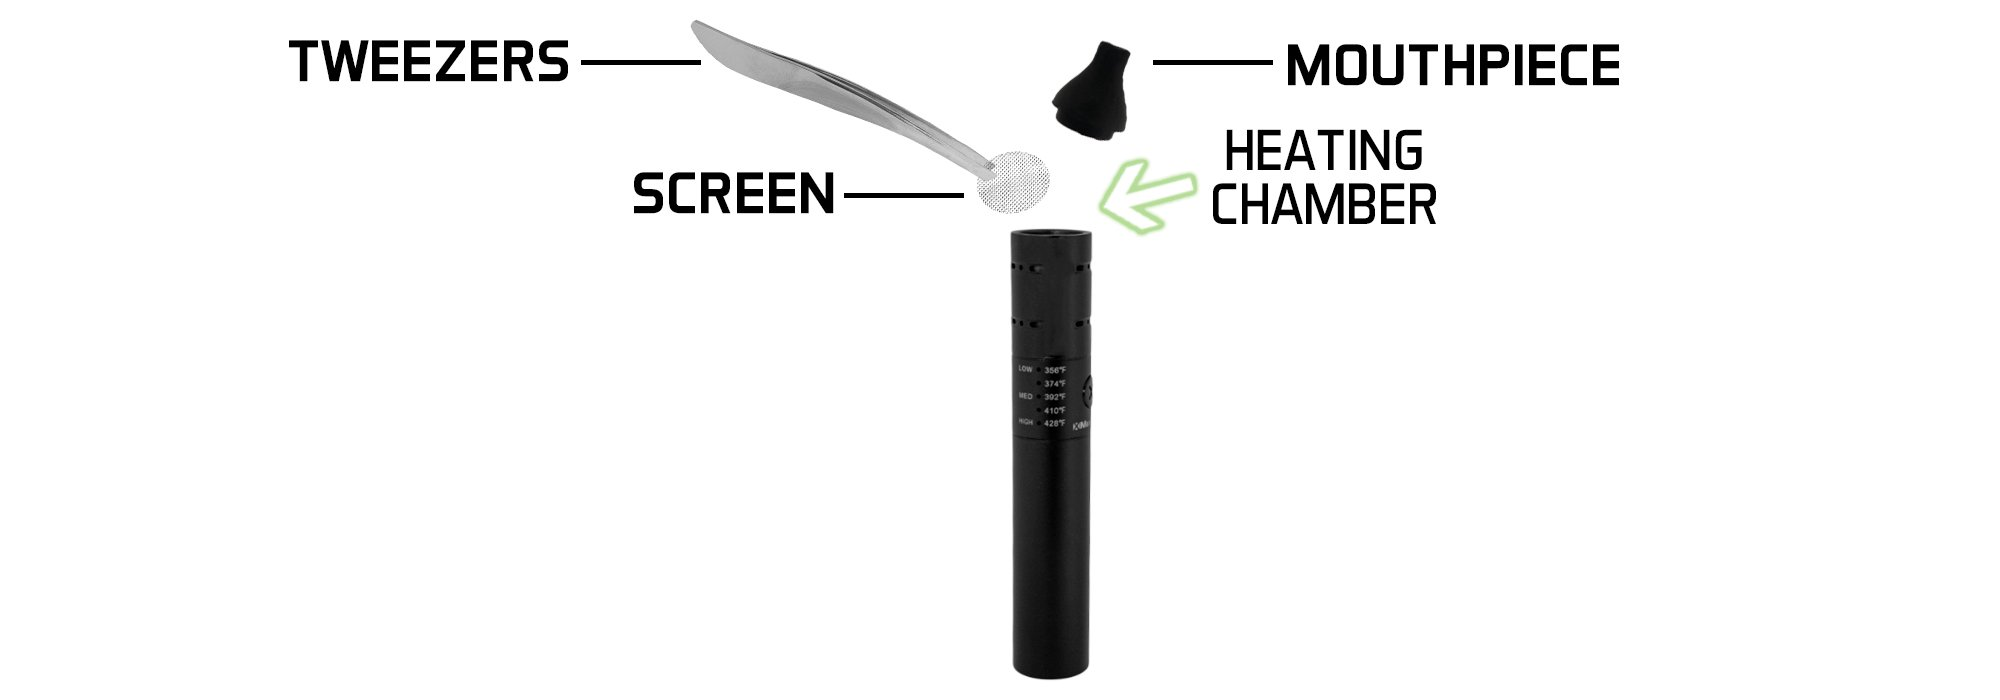 X-Max V2 Pro Inserting the Screen